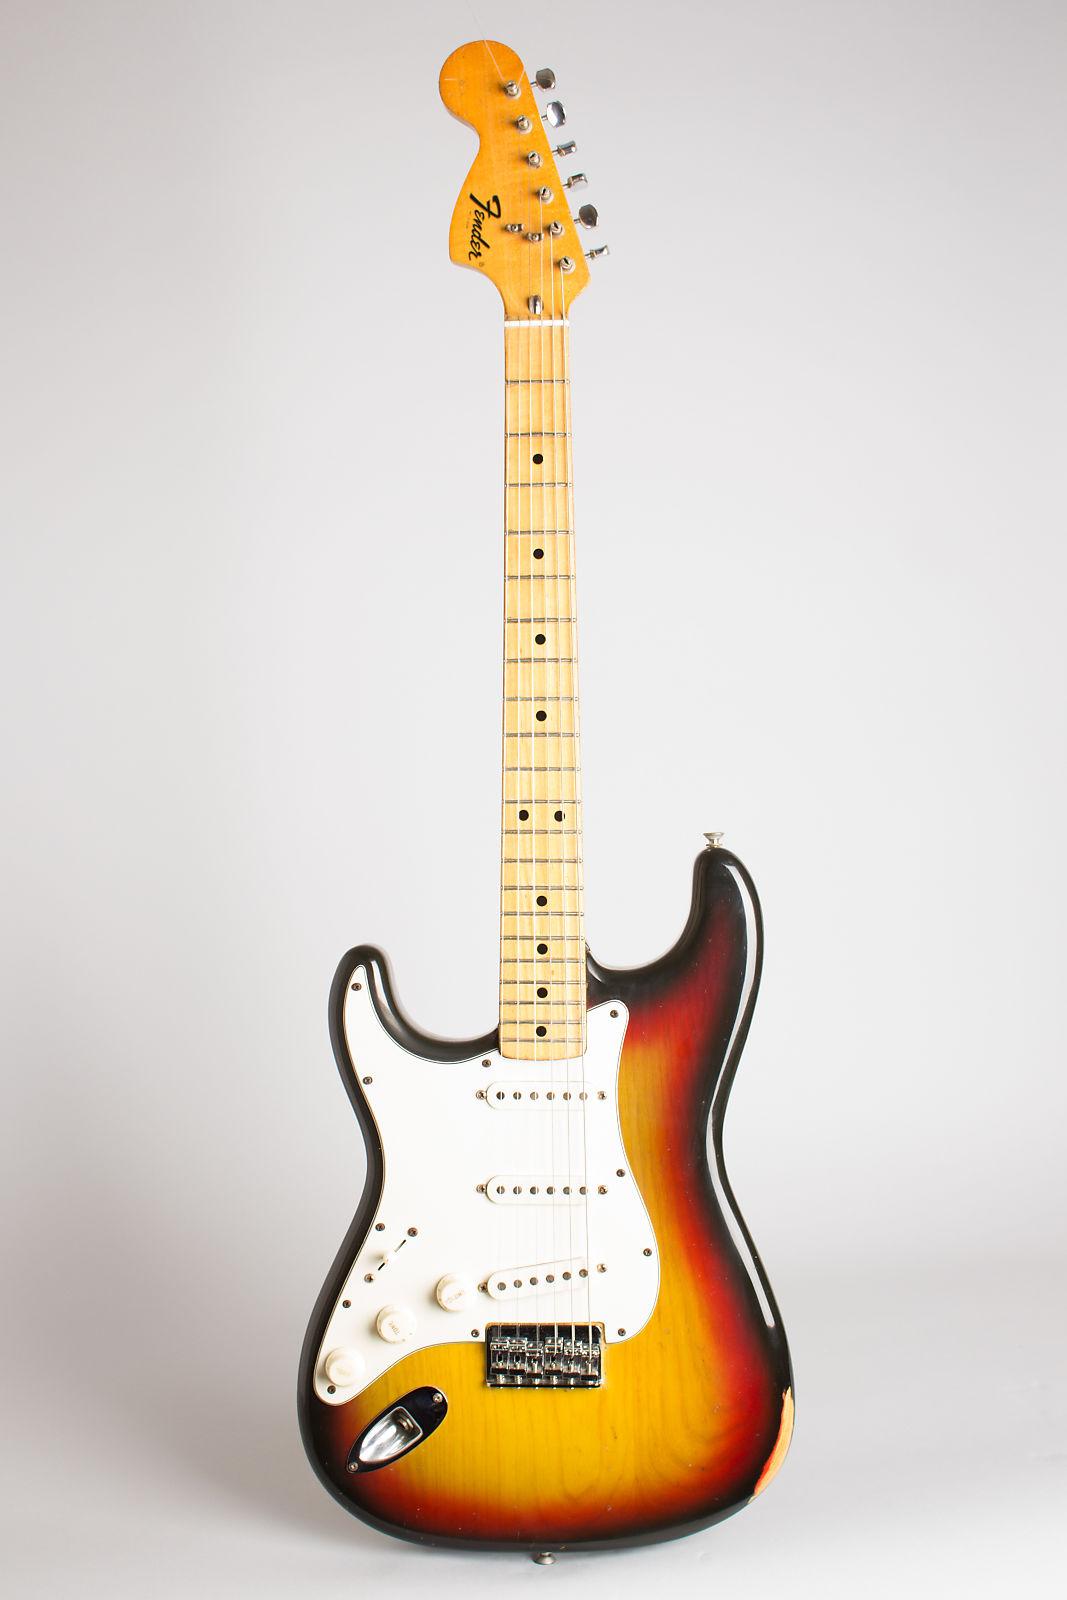 Fender  Stratocaster Solid Body Electric Guitar (1975), ser. #657648, black tolex hard shell case.